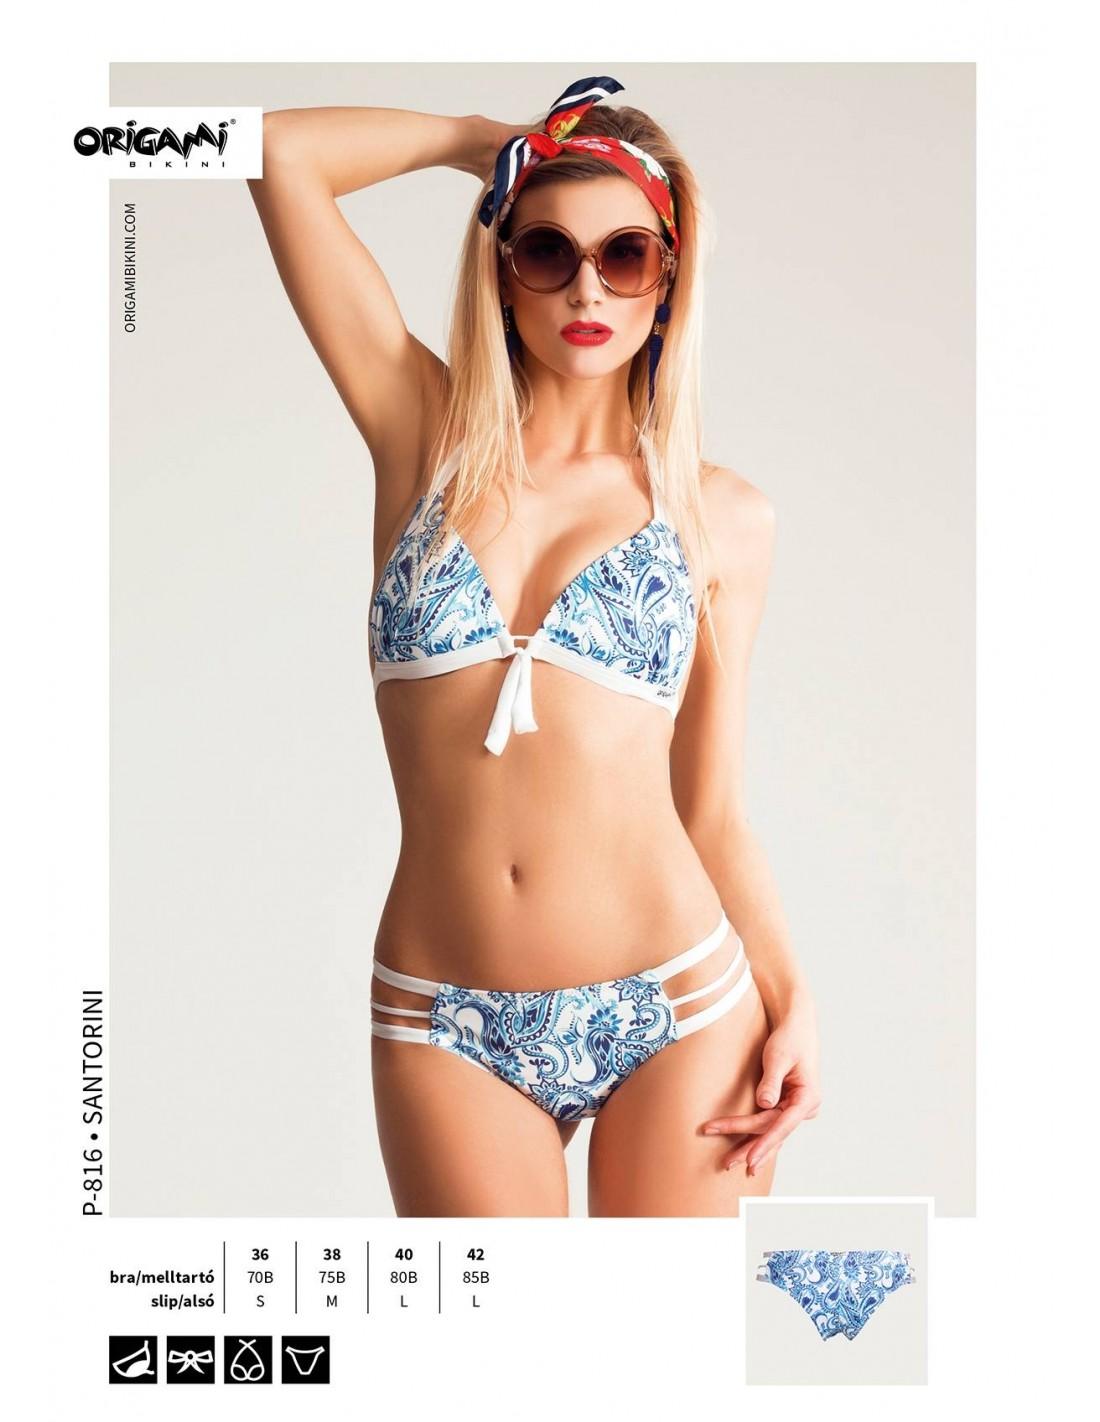 ... Origami Bikini P-816 Hódi Pamela fürdőruha ... b0a1847f10